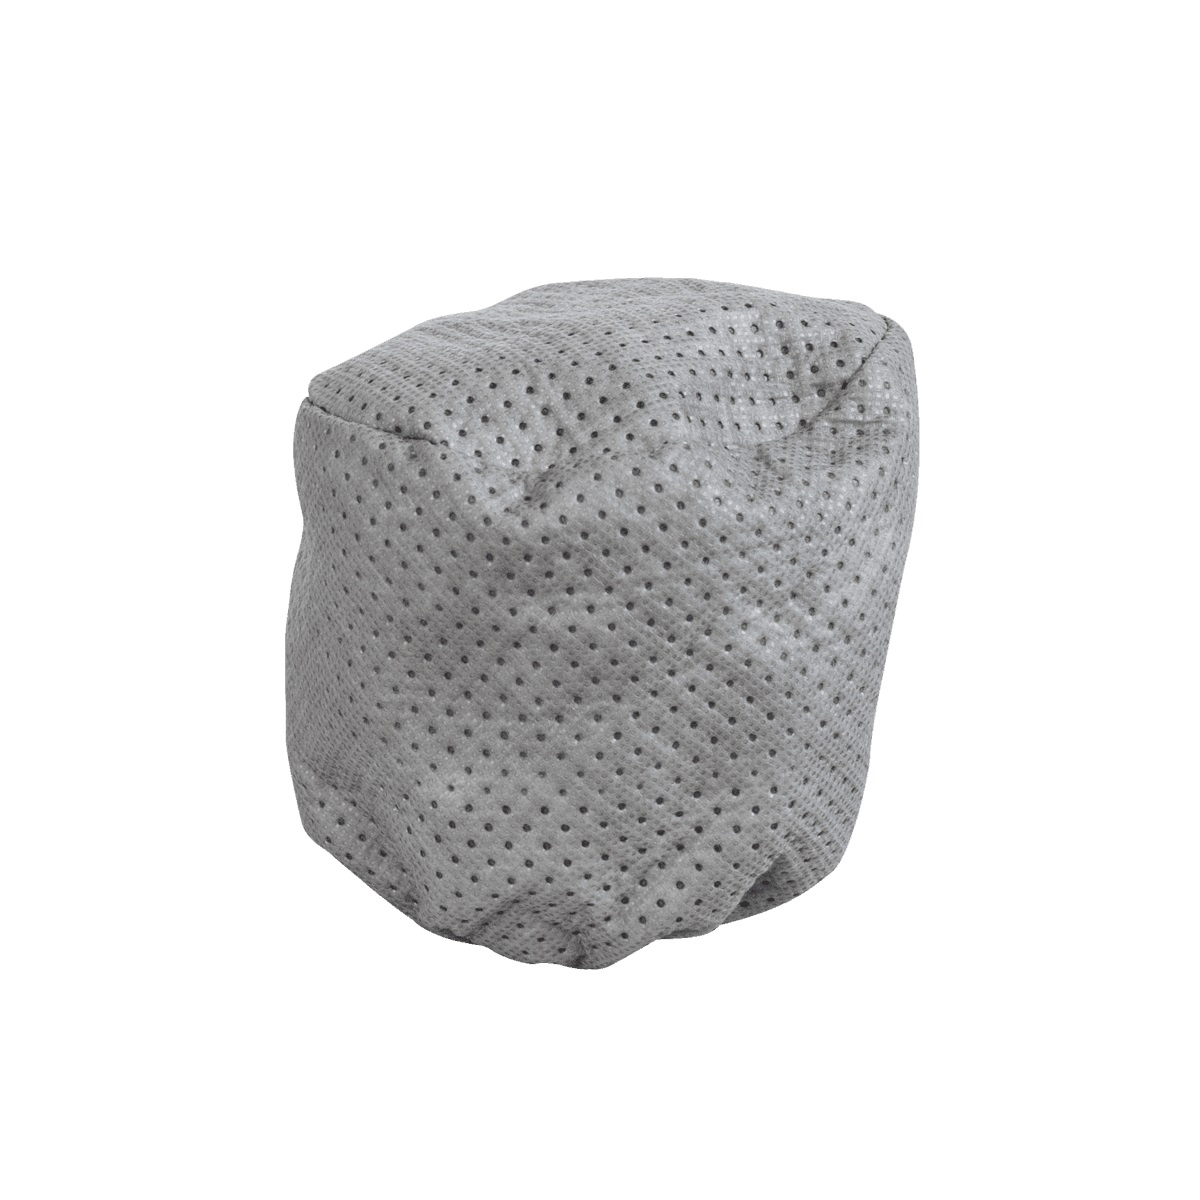 Scheppach Látkový filtr pratelný (sada 6 ks) pro ASP 15-ES, ASP 20-ES, ASP 30-ES